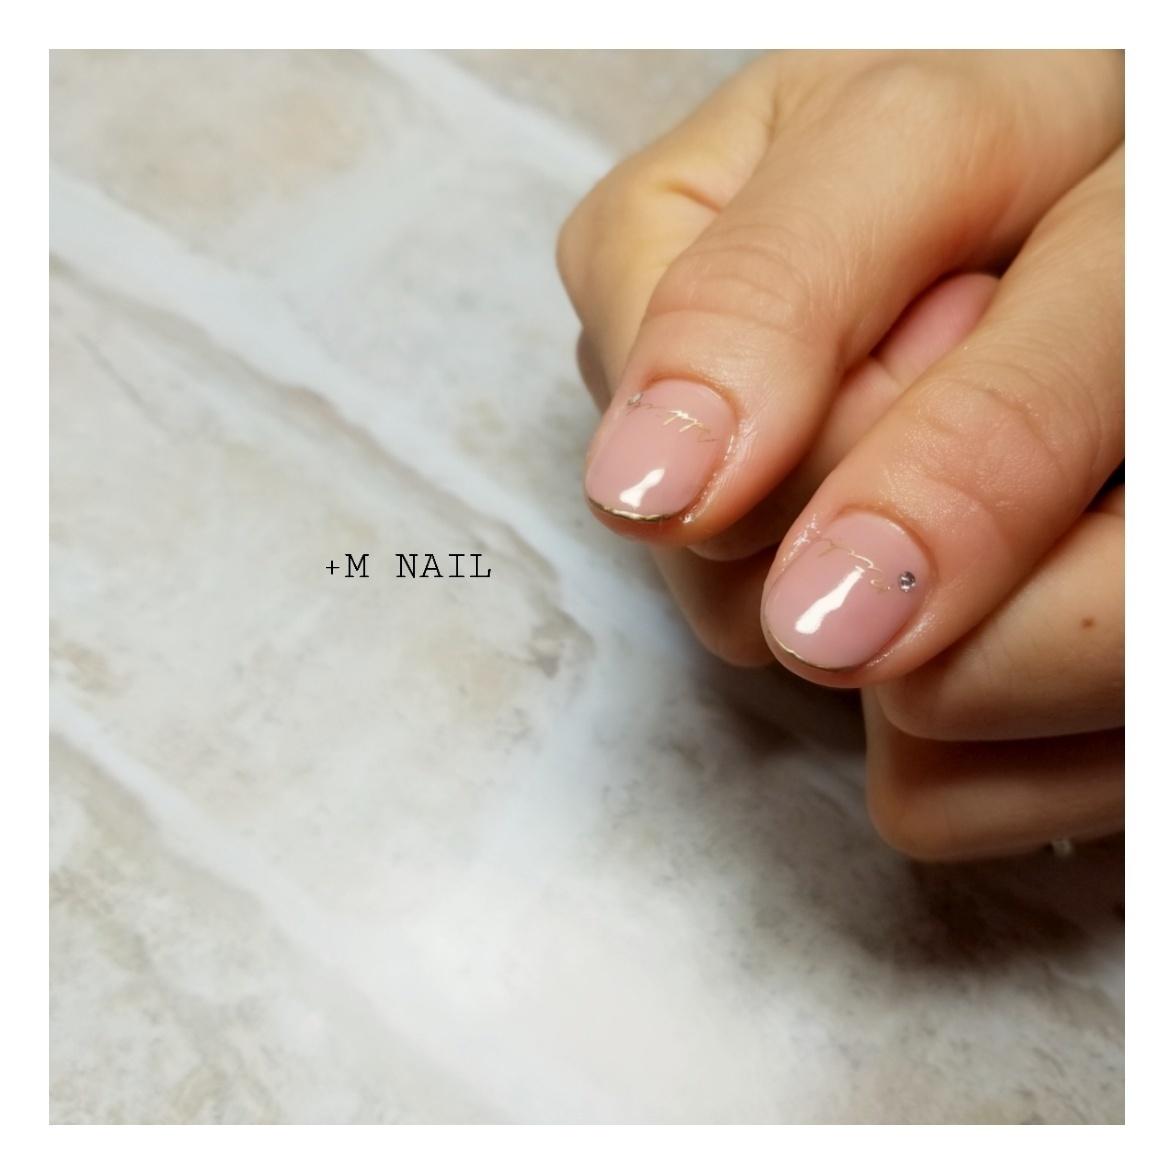 #nails #ジェル #ジェルネイル #ネイル #ネイルサロン #ネイルデザイン #ハンド #上品ネイル #大人ネイル #大人可愛い#親指ネイル#英字ネイル#ピンクベージュ